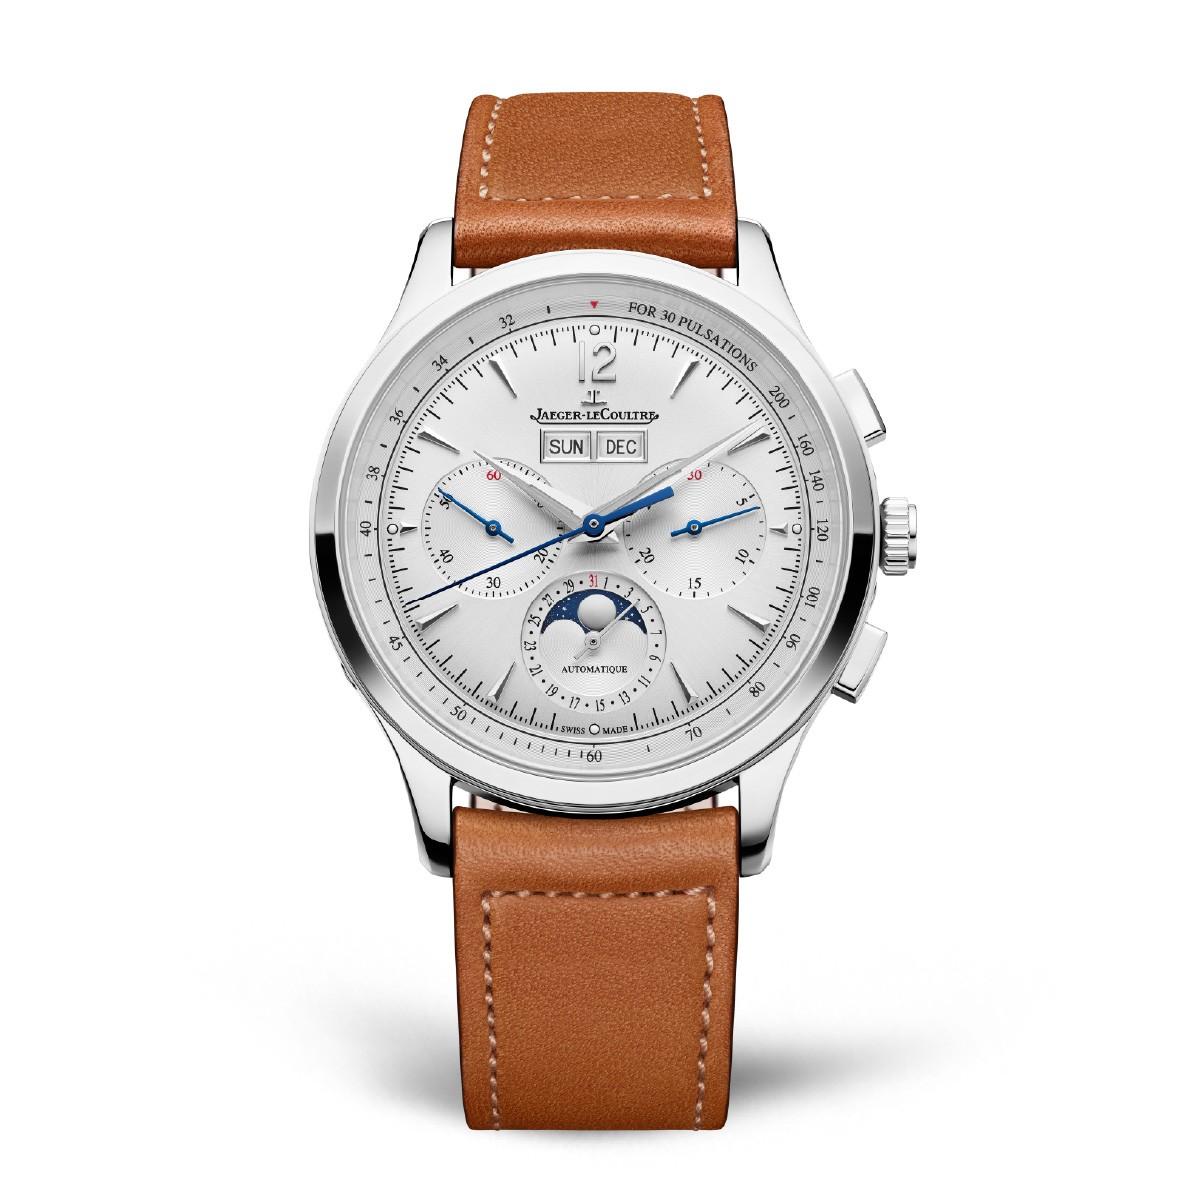 Produkt1jlc-master-control-chronograph-calendar-q4138420-front